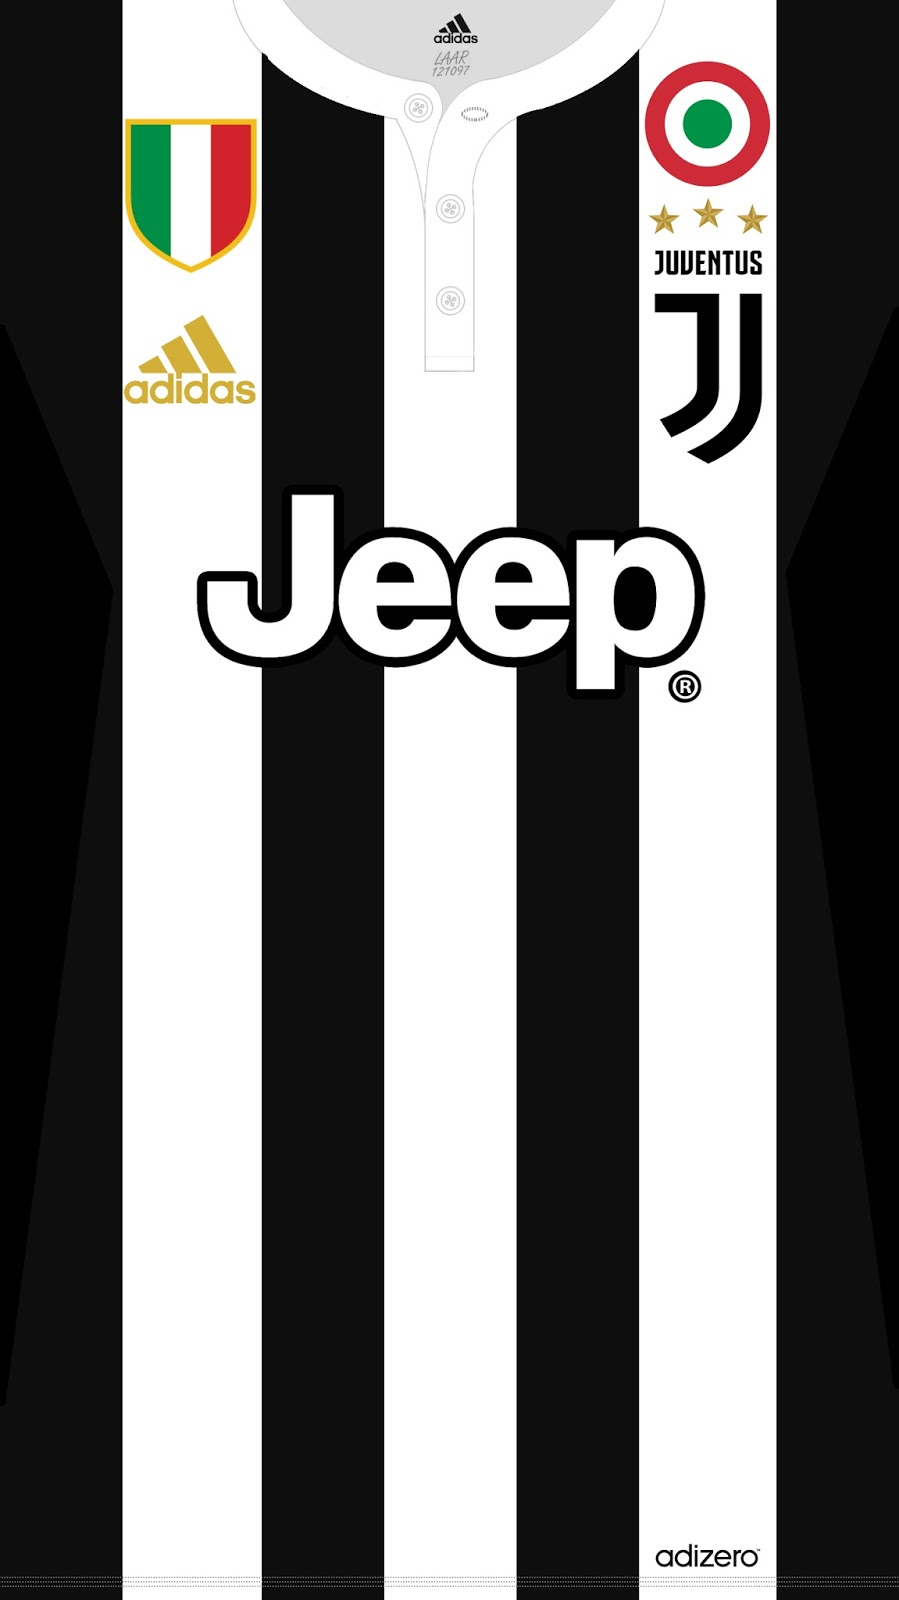 Manchester United Iphone Wallpaper Hd Wallpaper Jersey Juventus Football Club Serie A 2017 2018